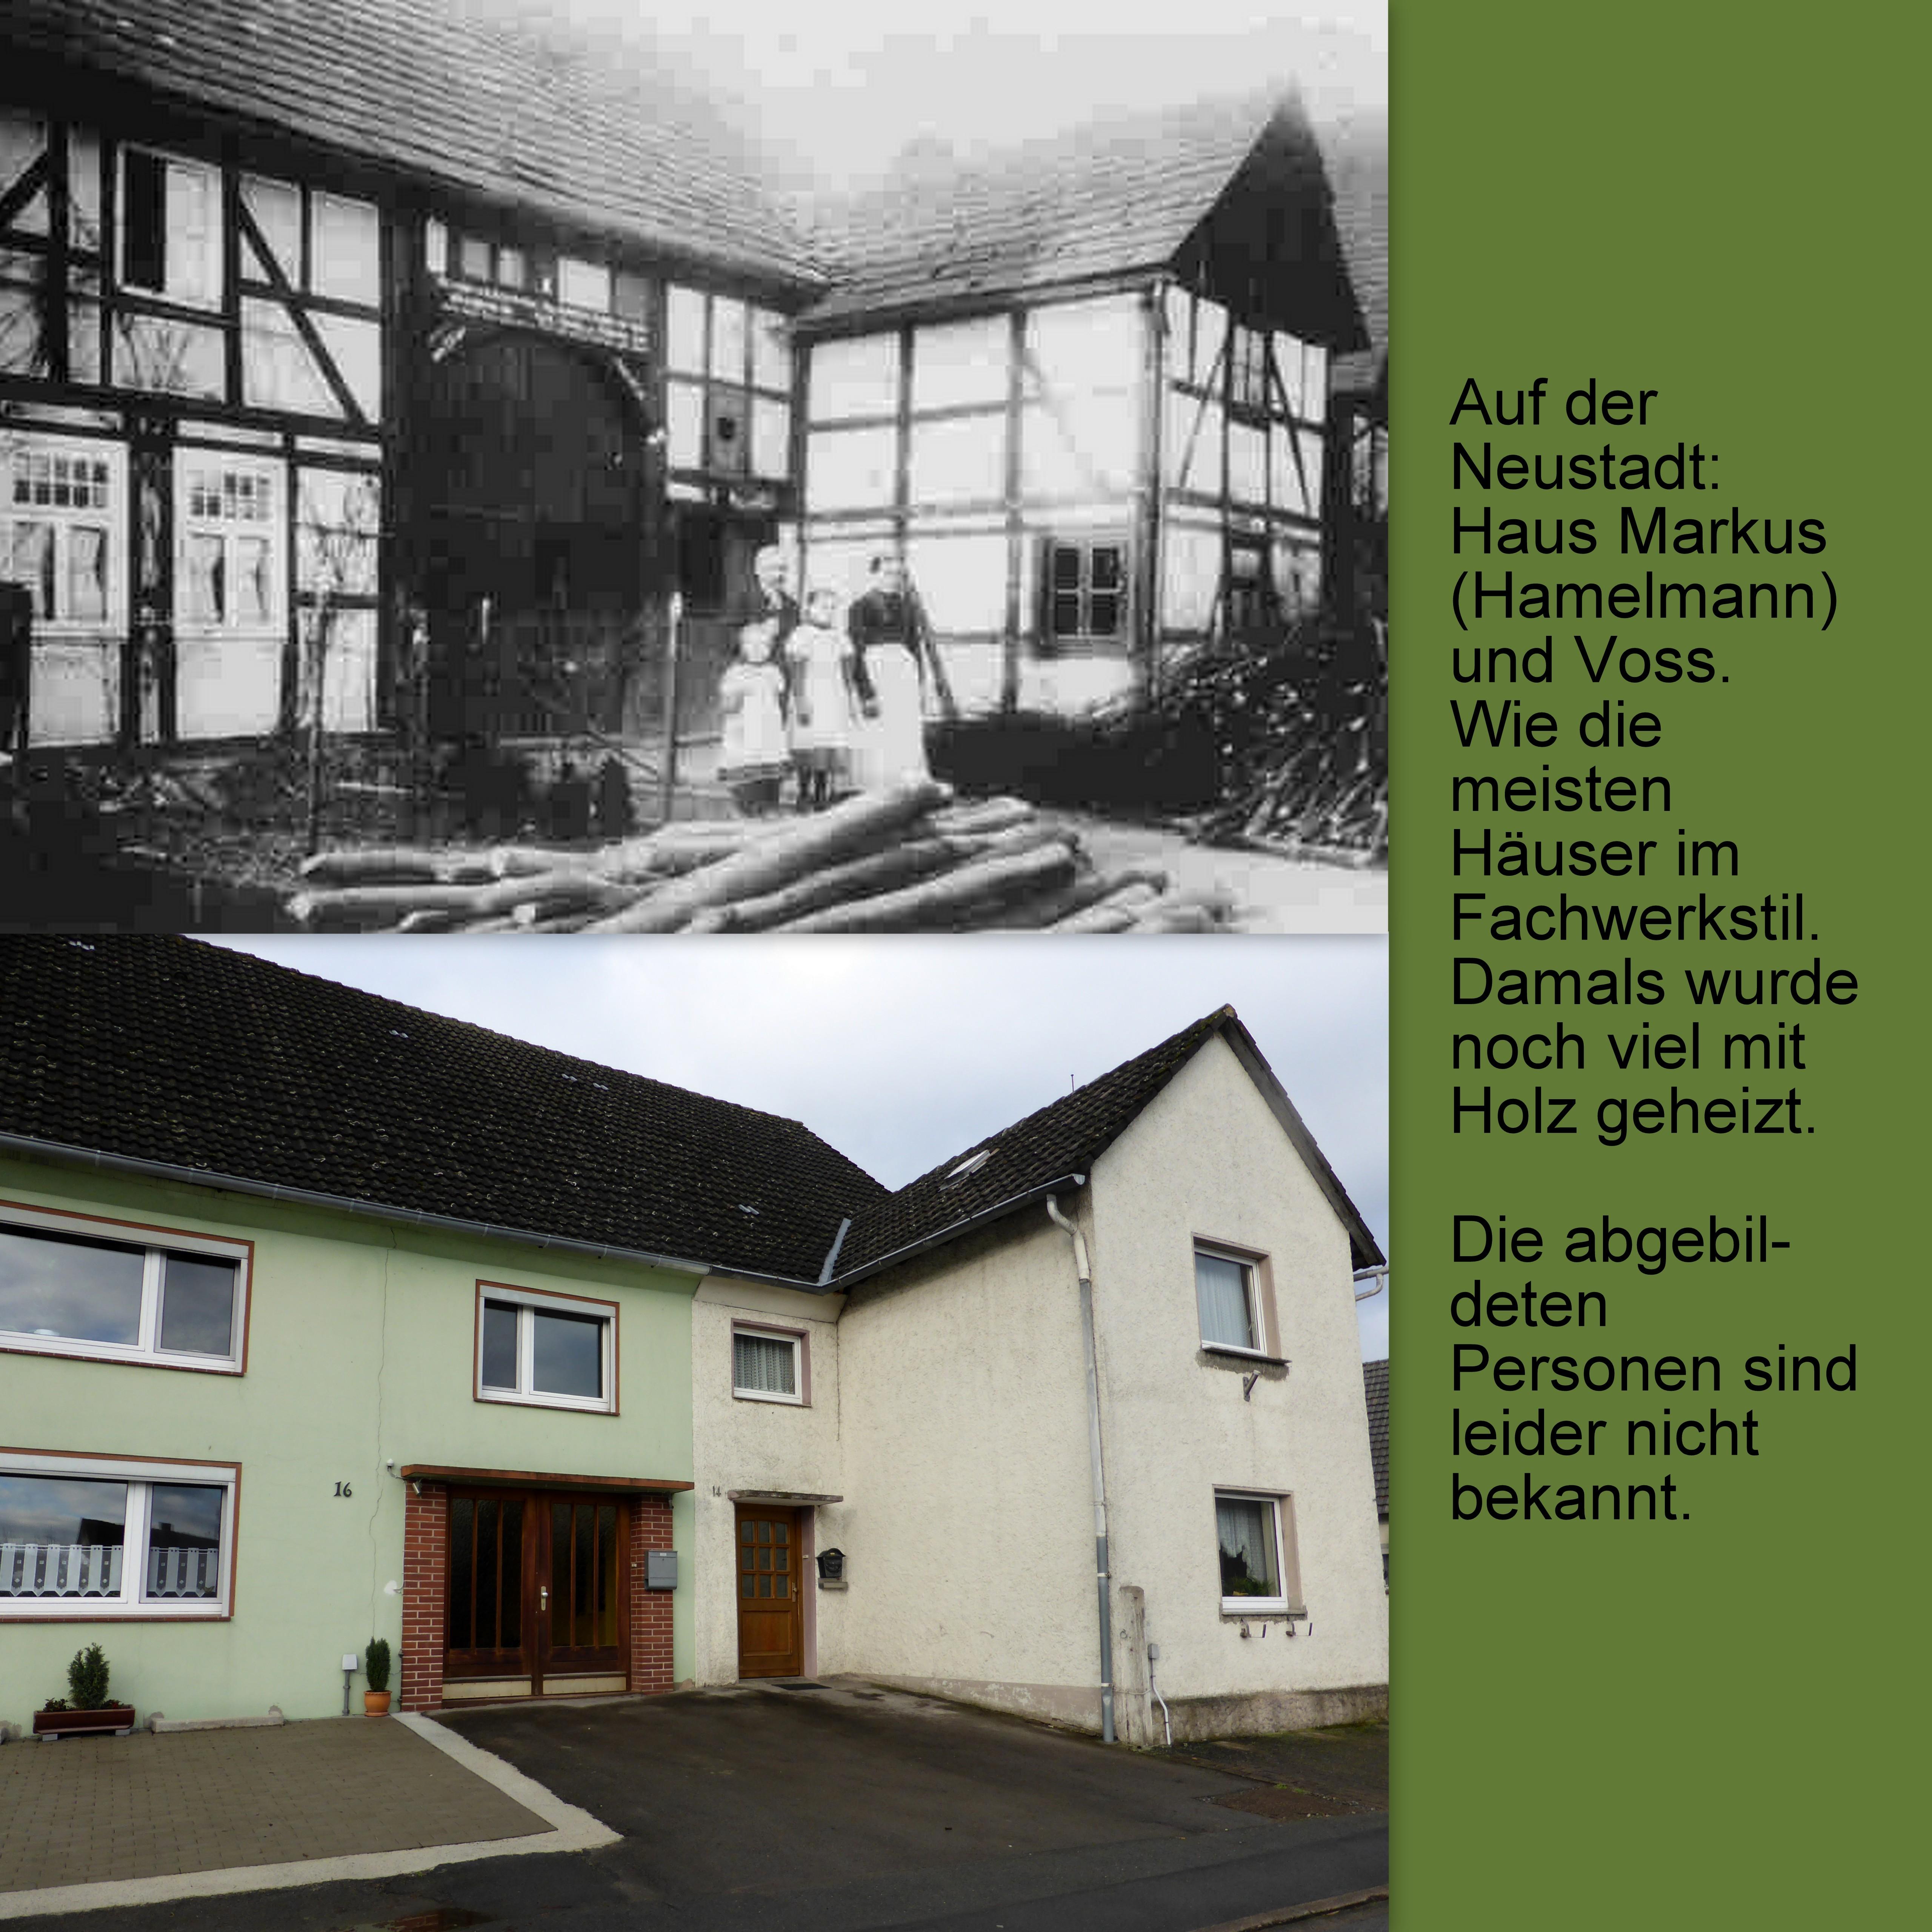 Haus-Markus-Voss